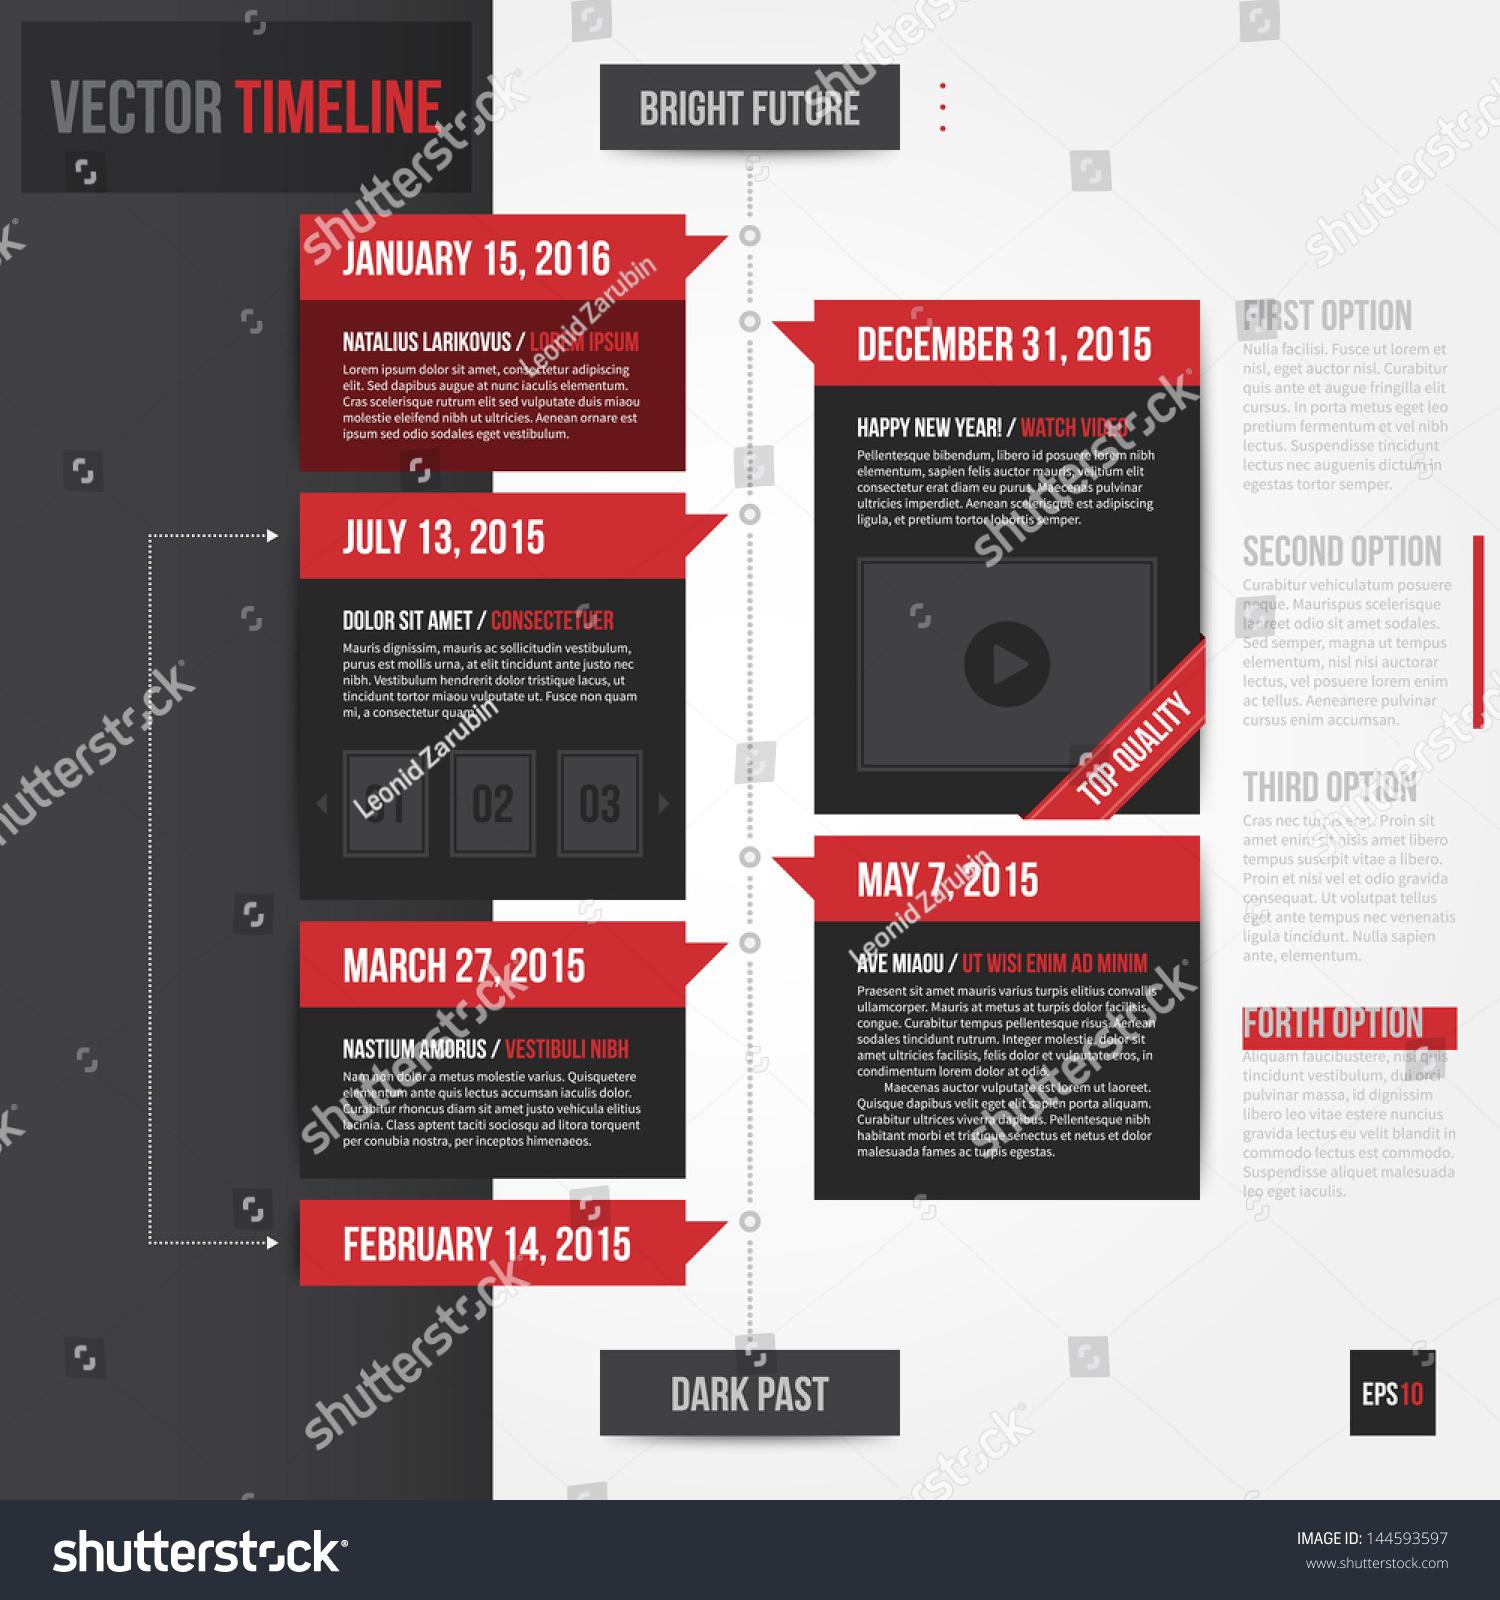 Vertical Timeline Template Eps10 Stock Vector 144593597 - Shutterstock